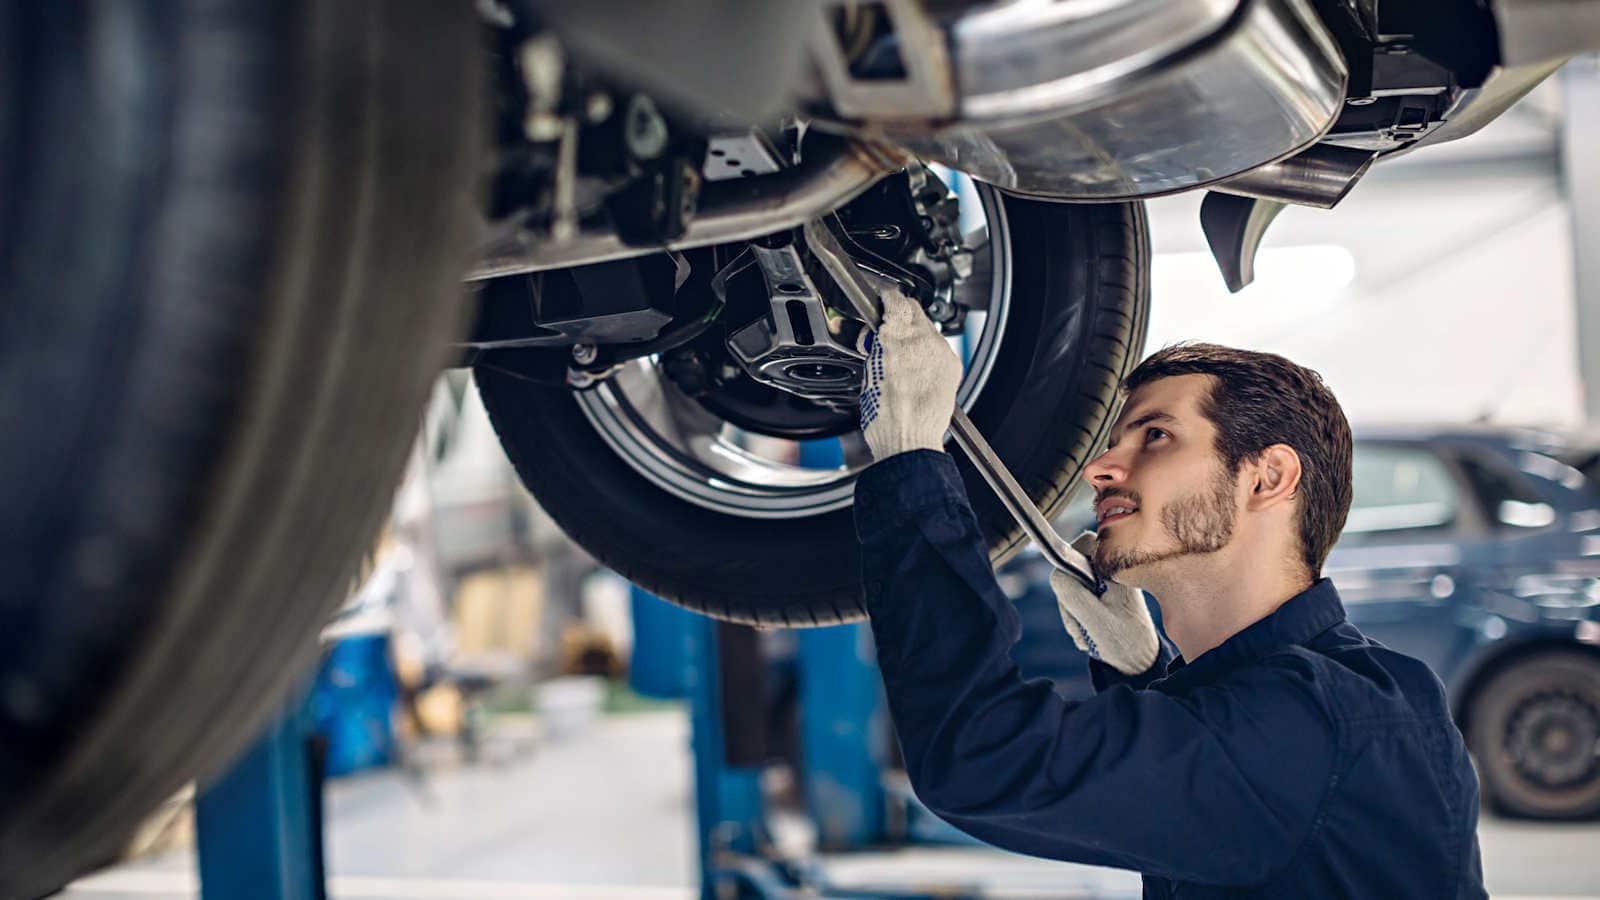 Sease's Auto Services & Repair of San Jose